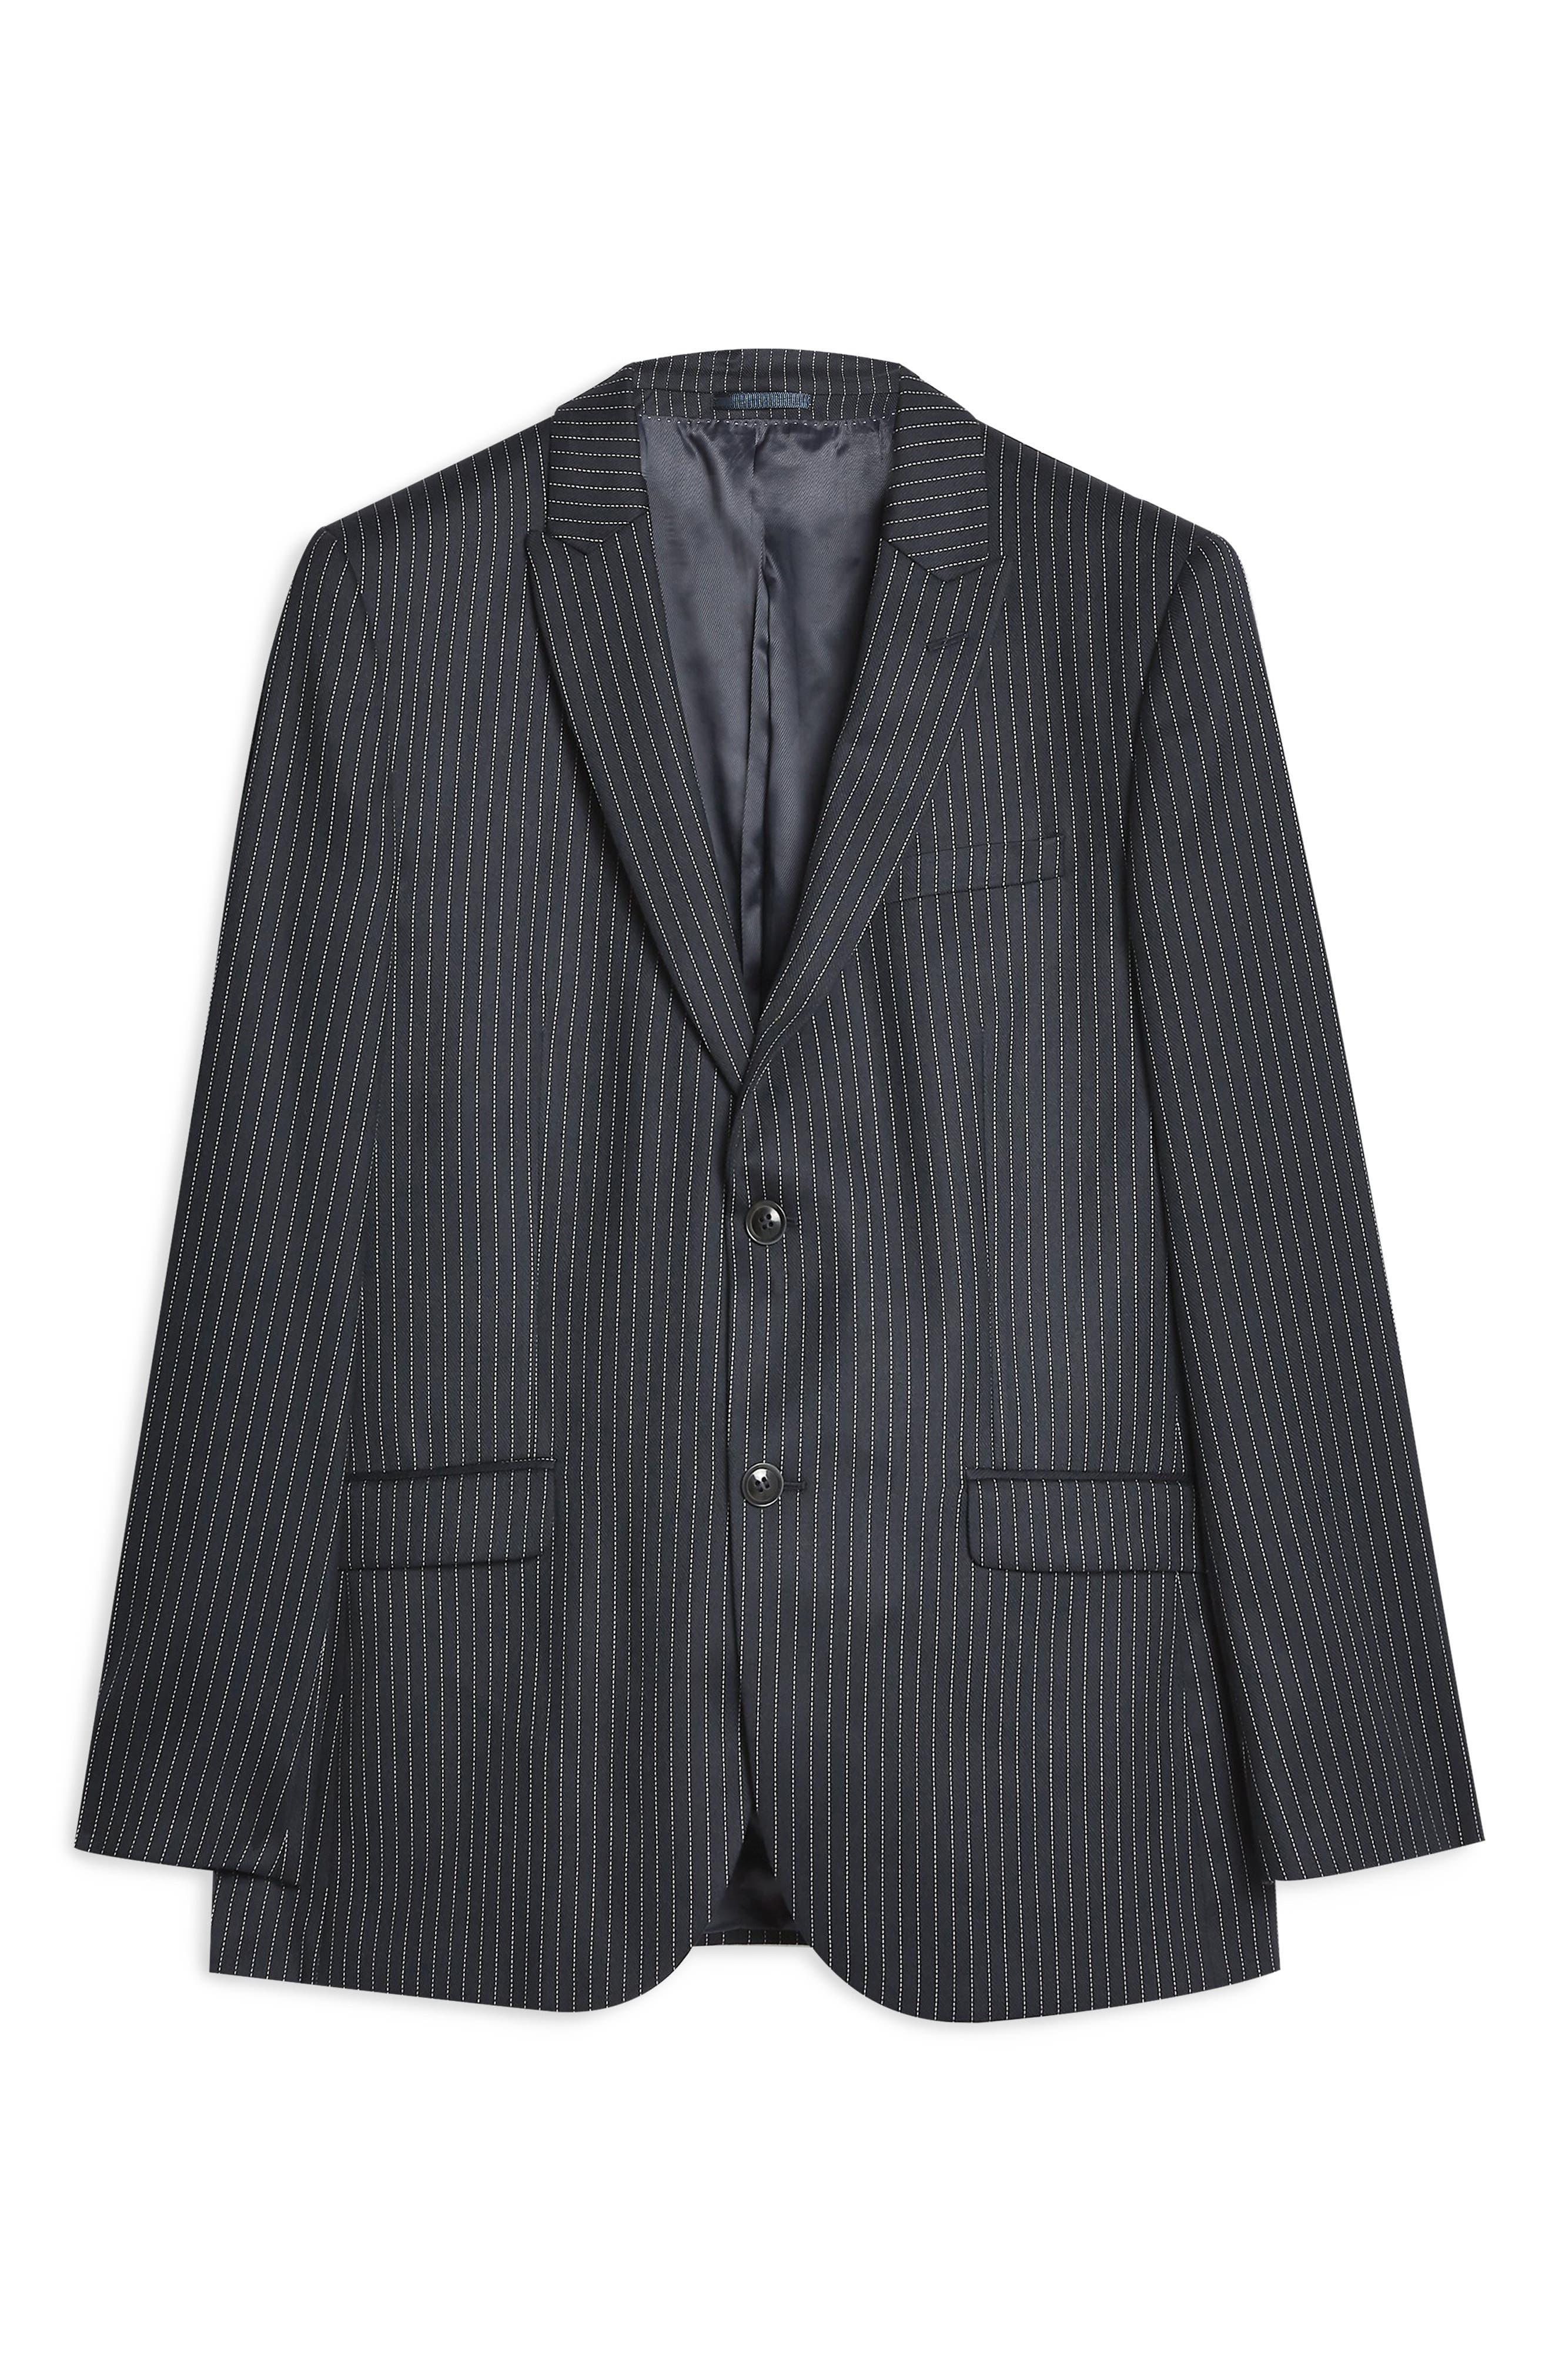 Tailored Pinstripe Suit Jacket,                             Alternate thumbnail 4, color,                             NAVY BLUE